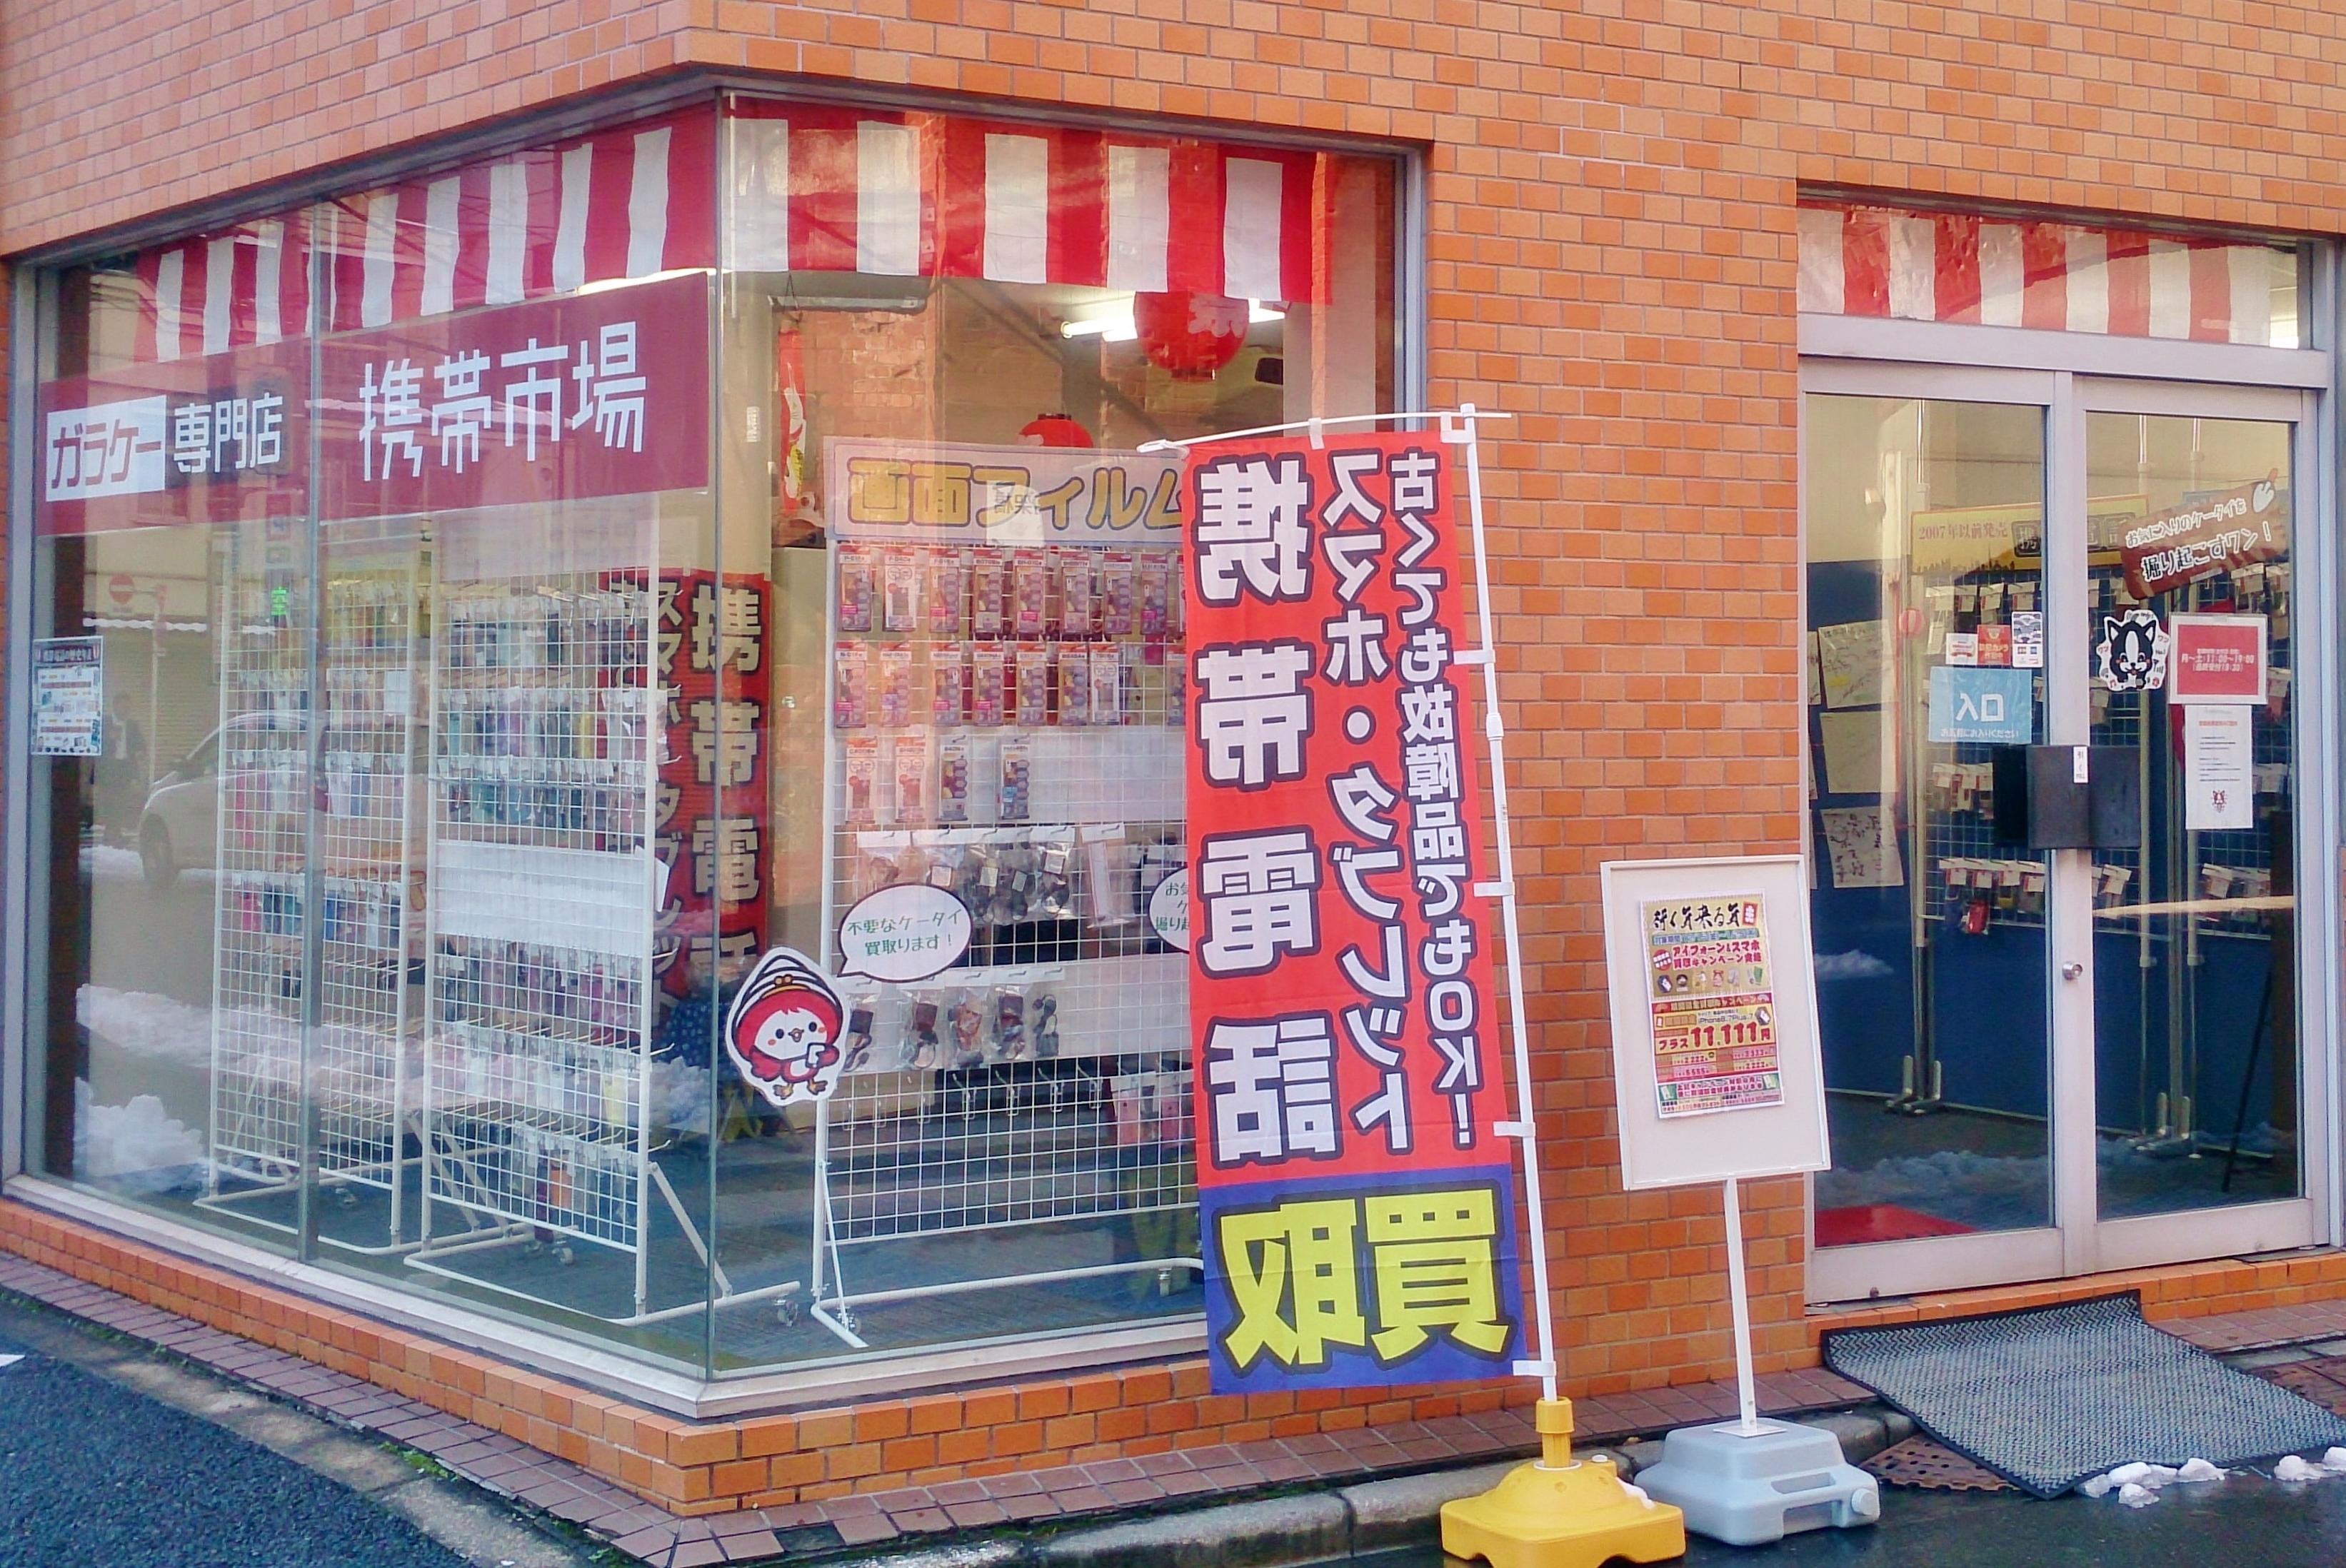 ガラケー専門店 携帯市場 神田店 店舗外観2